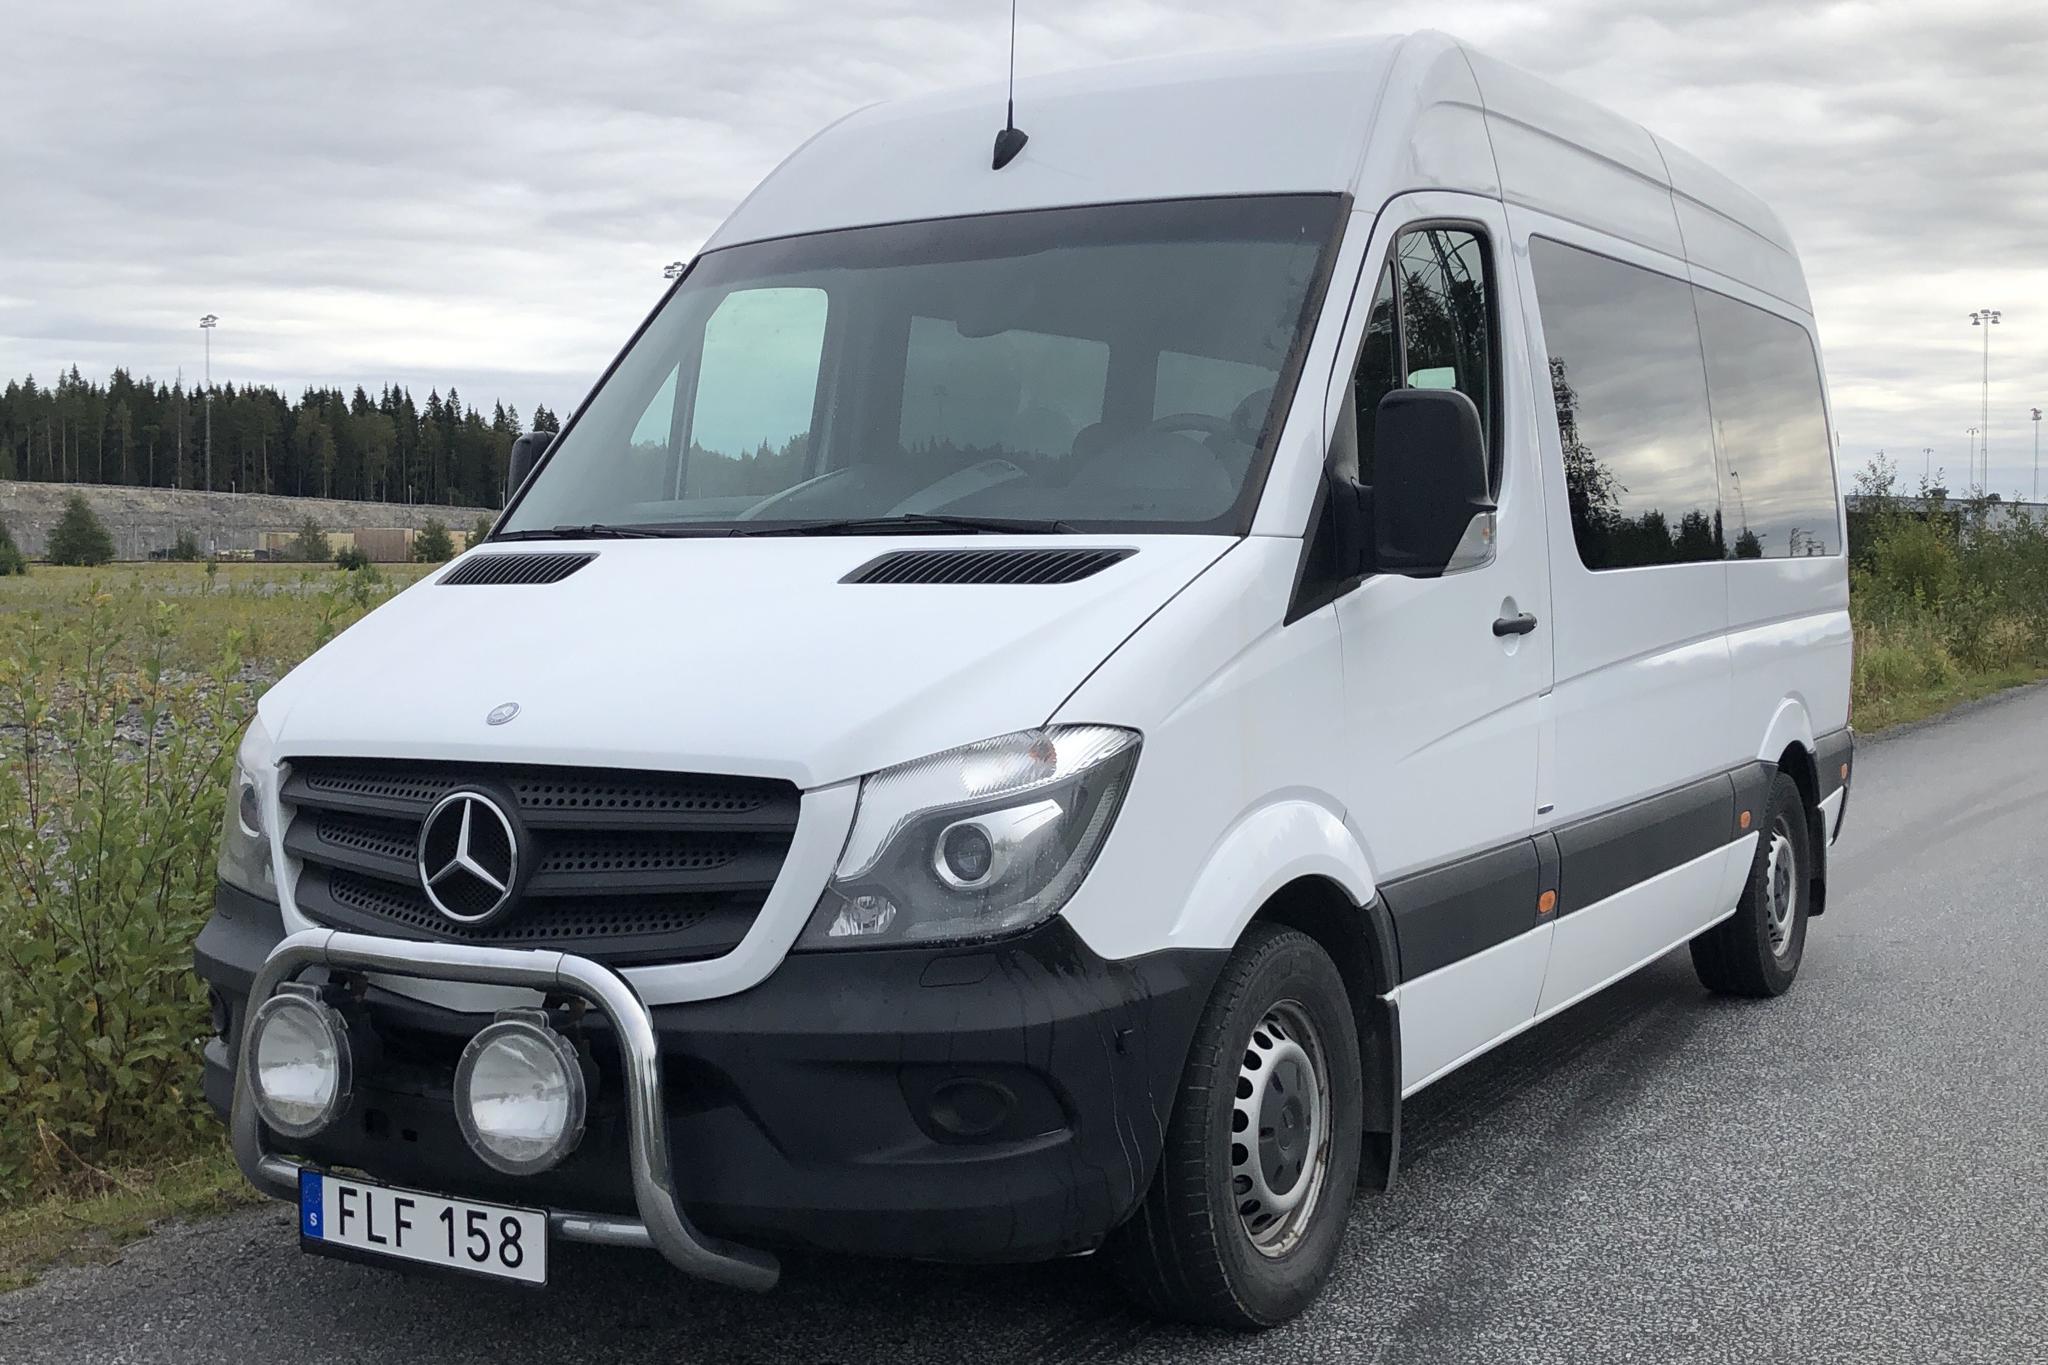 Mercedes Sprinter 316 CDI (163hk) - 303 690 km - Automatic - white - 2015